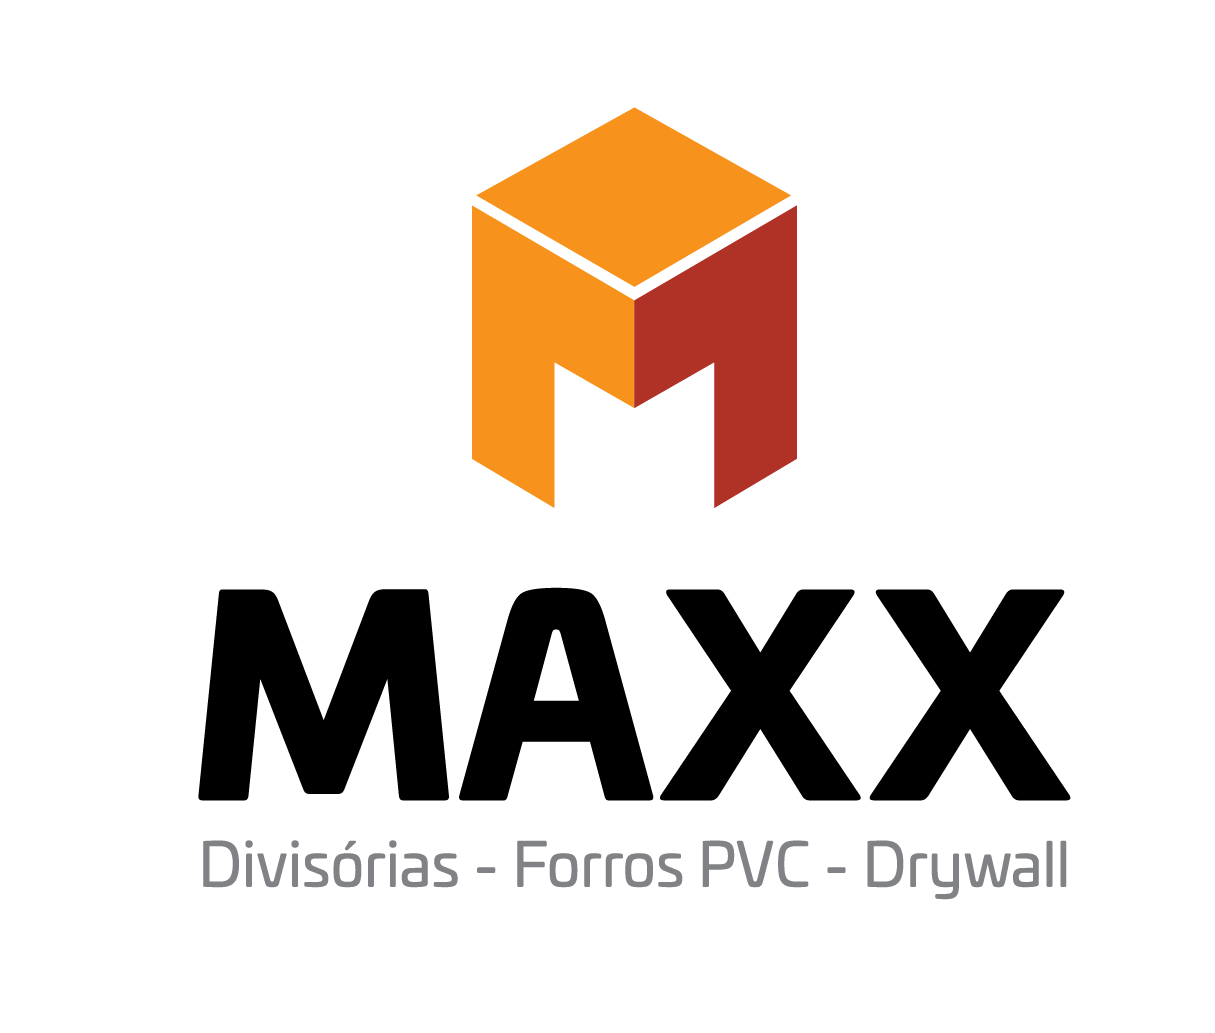 Onde Comprar Forro de Pvc Colorido Ferraz de Vasconcelos - Forro de Pvc Marrom - Maxx Forro